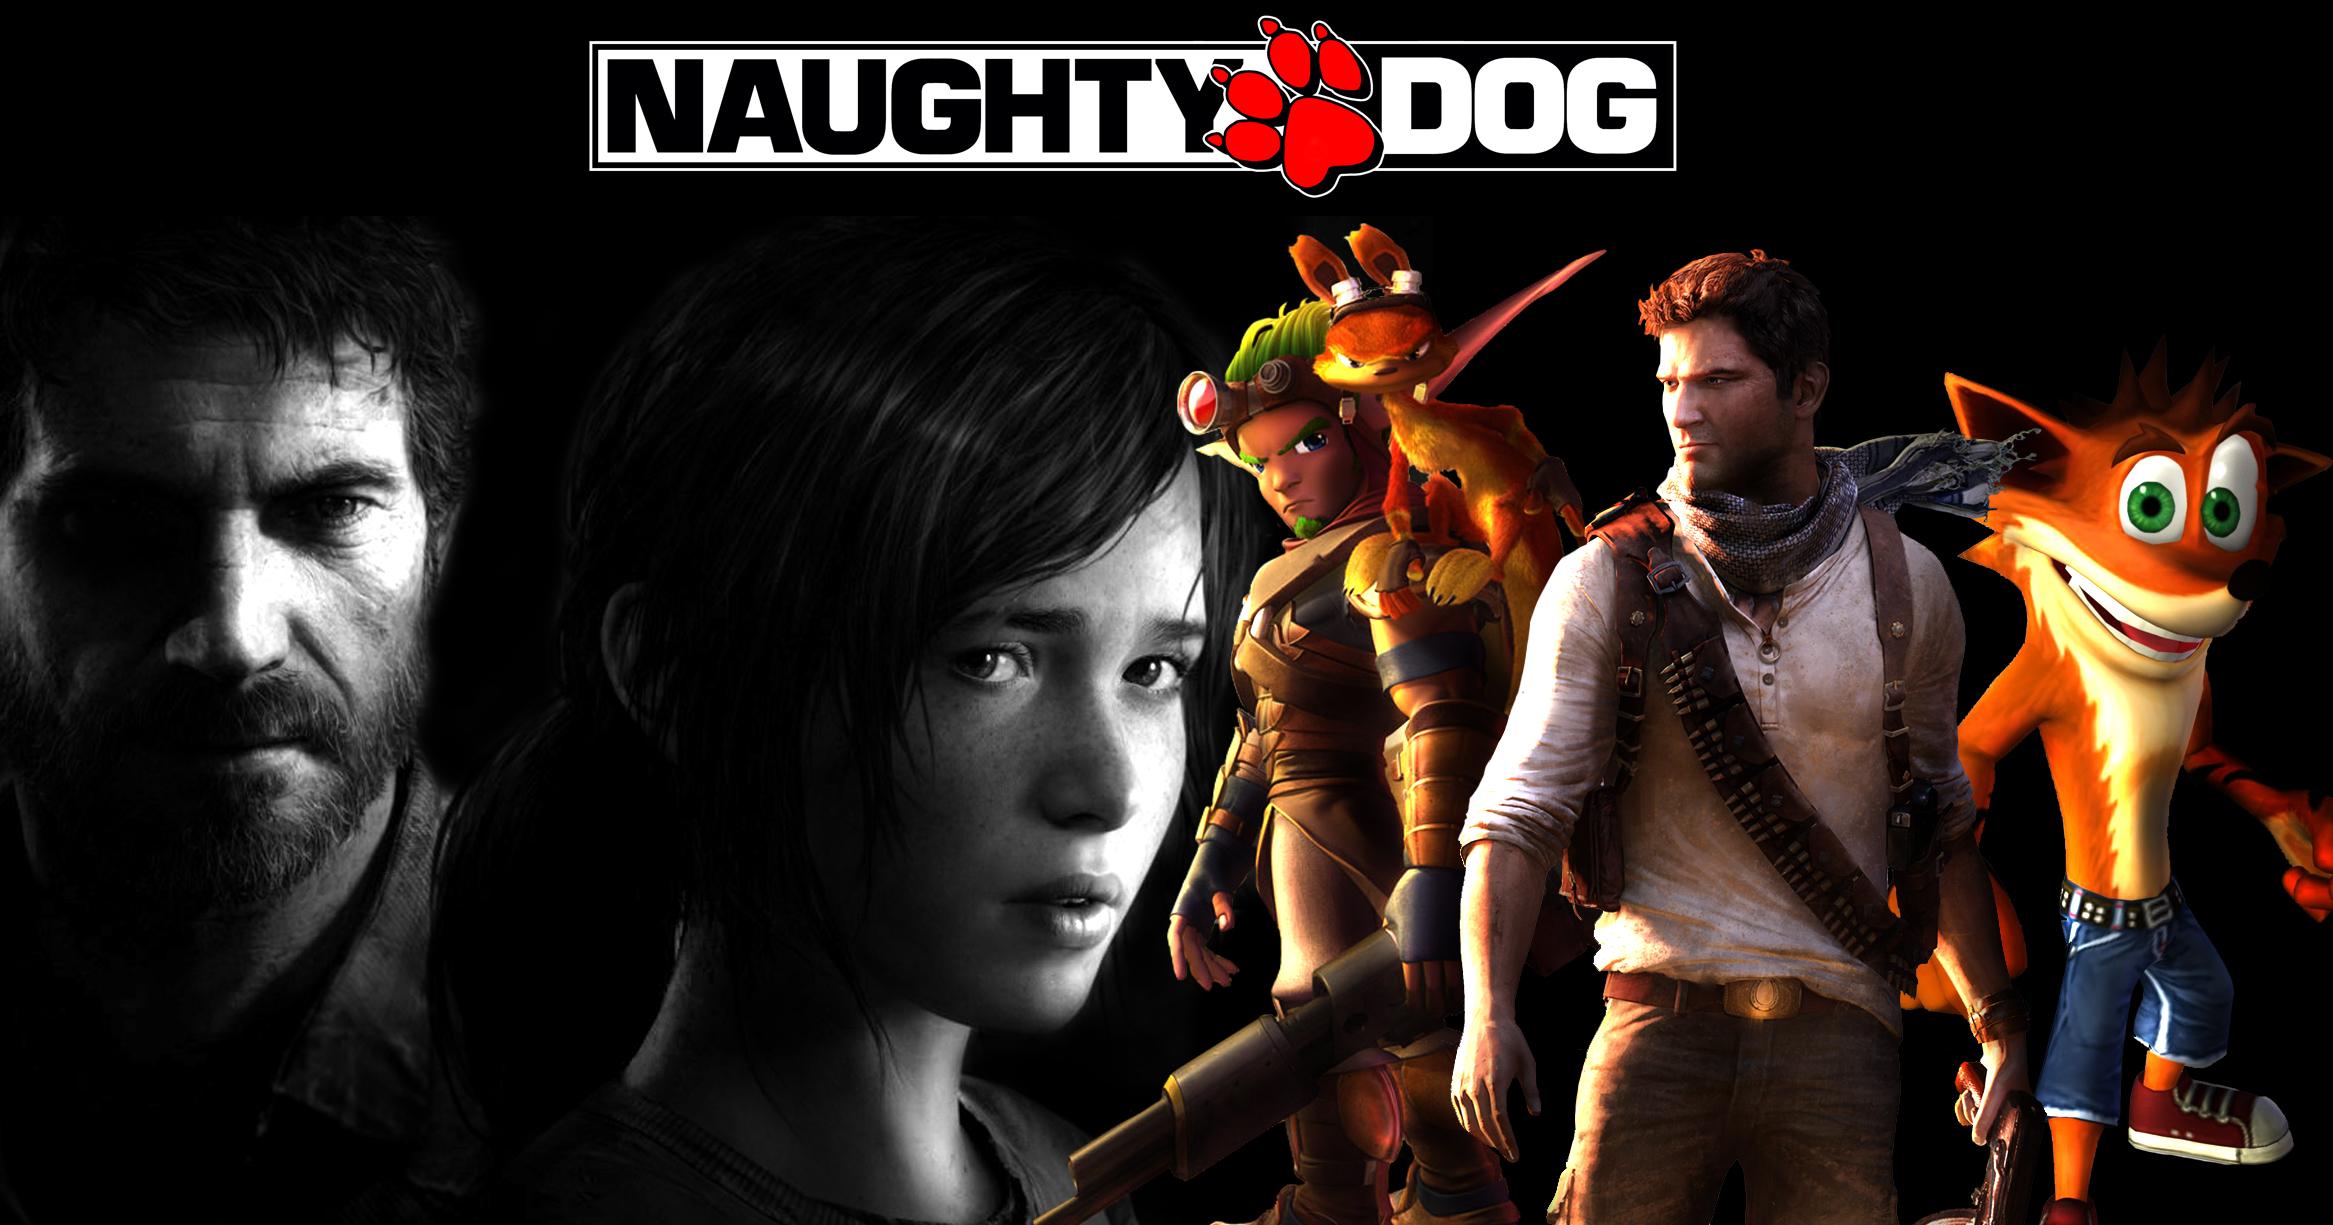 Naughtydog_by_comicsleo-d5c8k5h.jpg